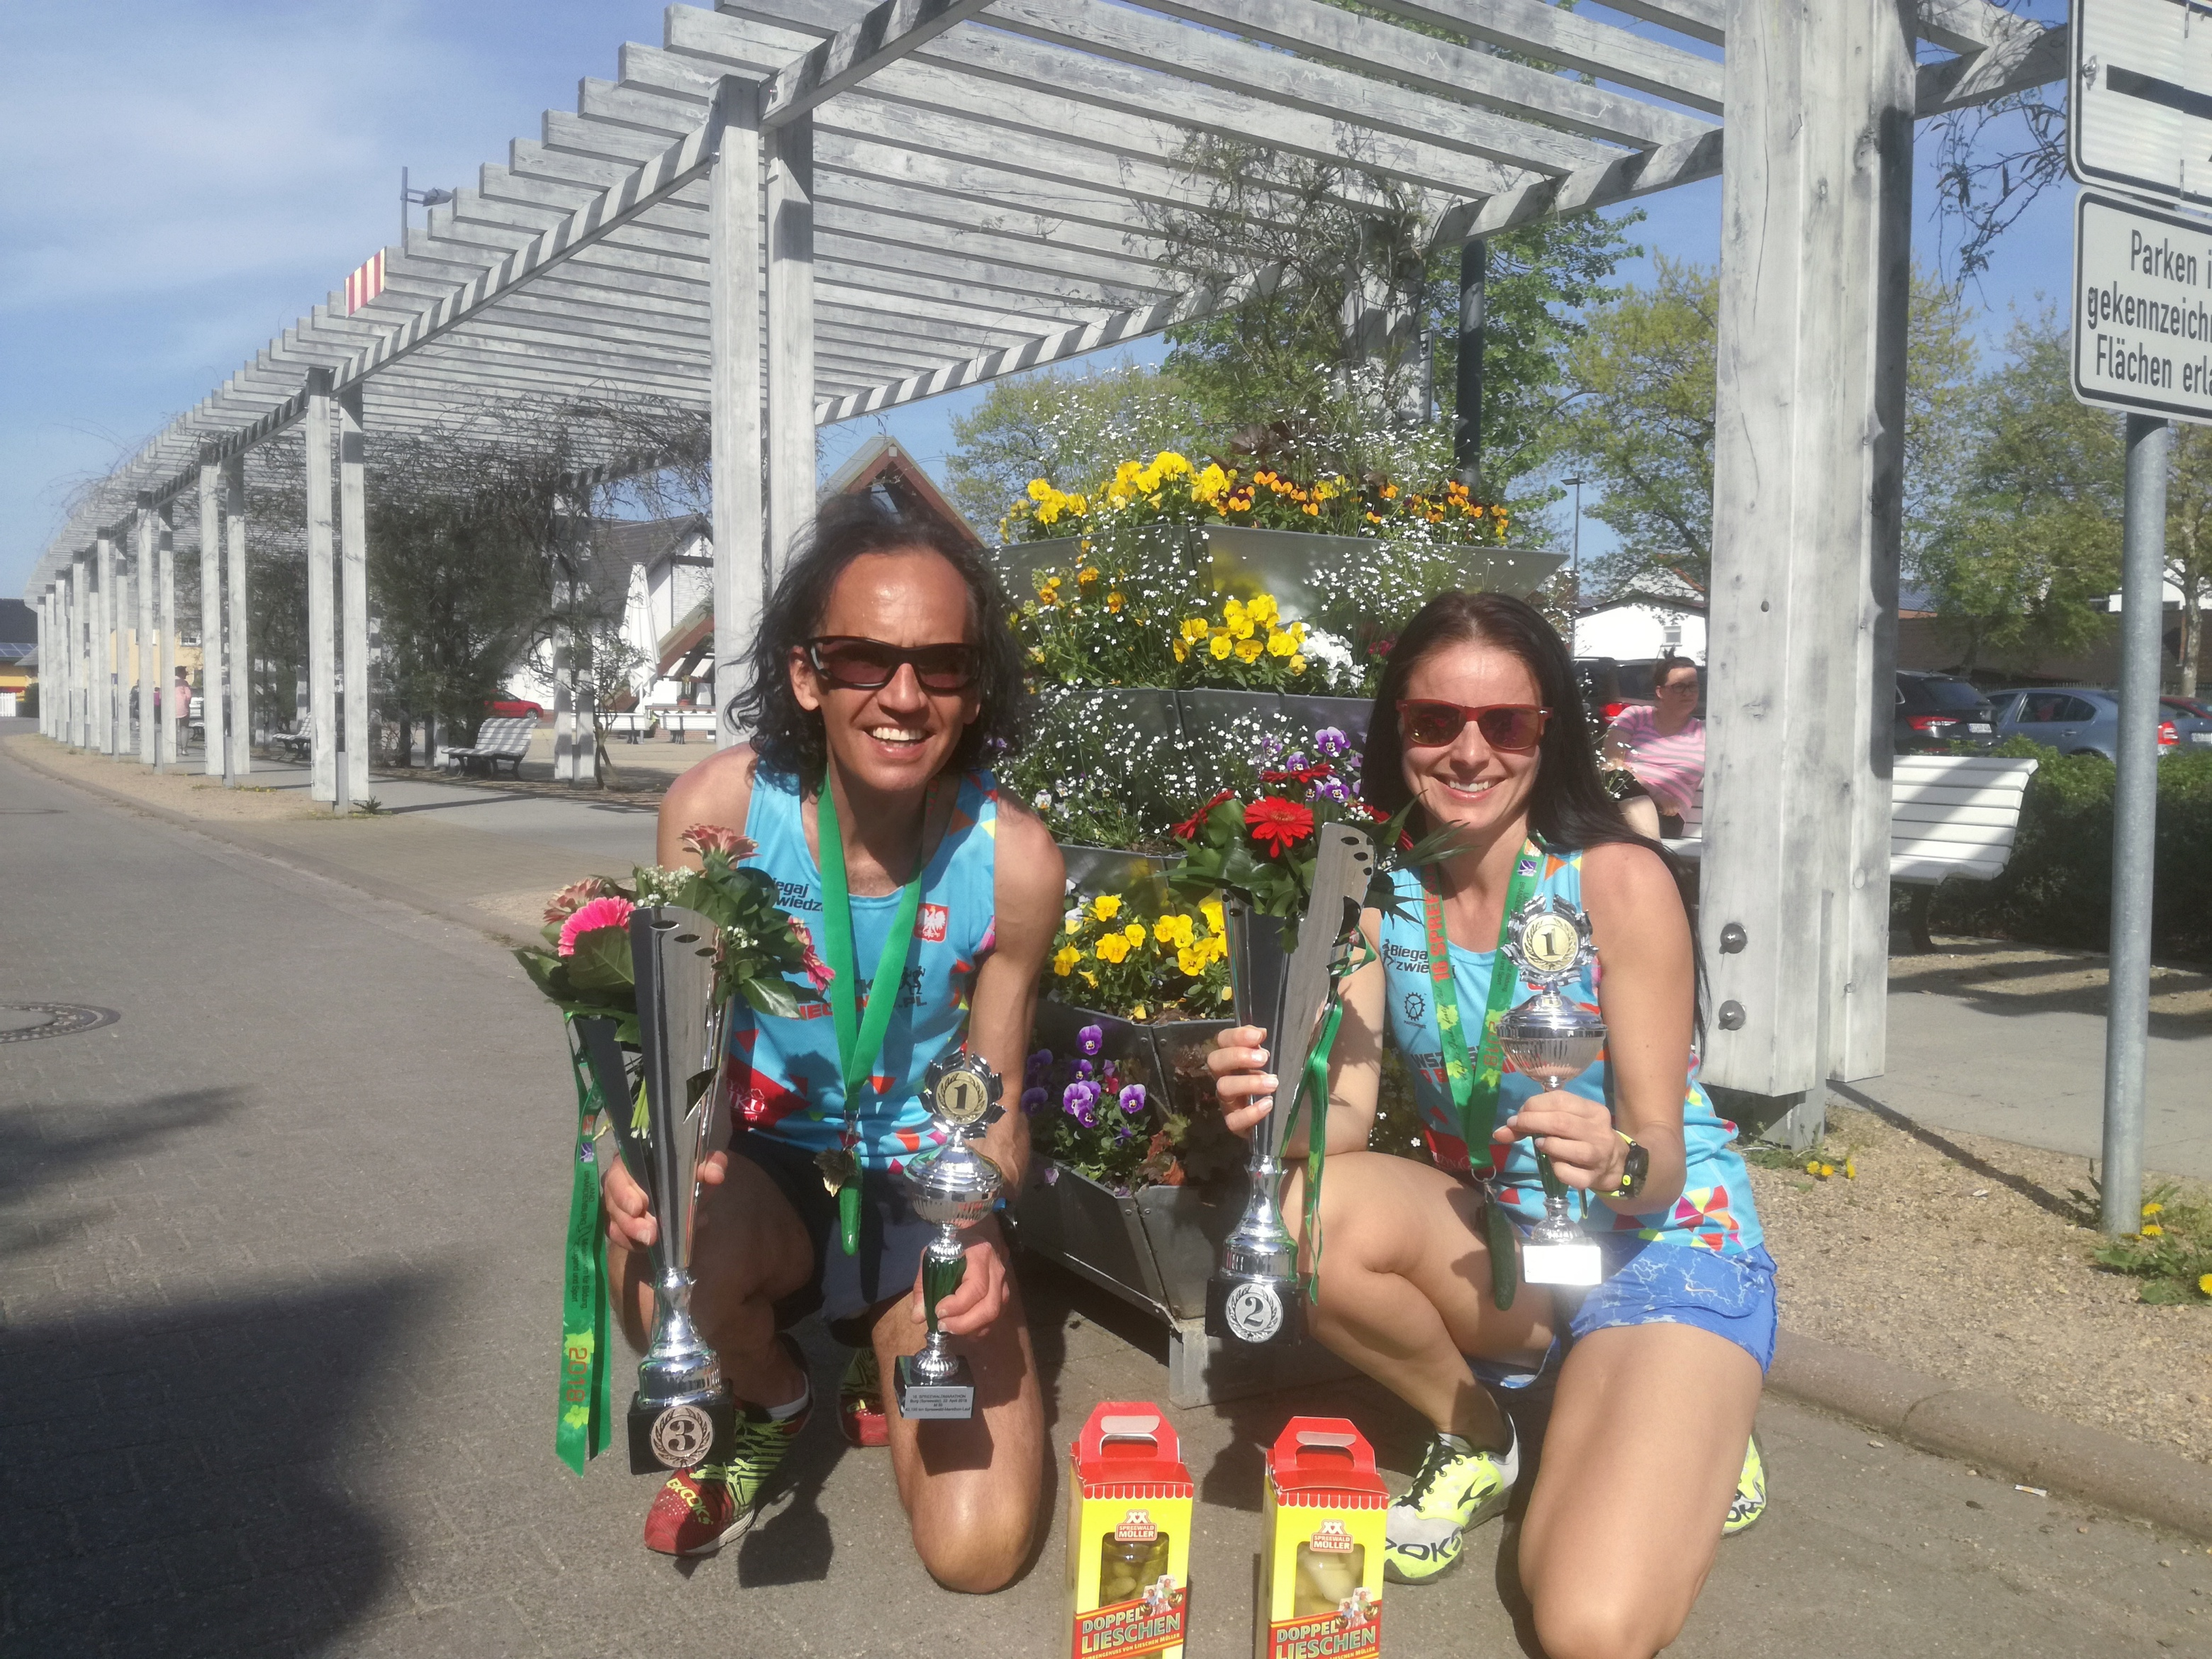 Nasi reprezentanci na podium maratonu w Brandenburgii